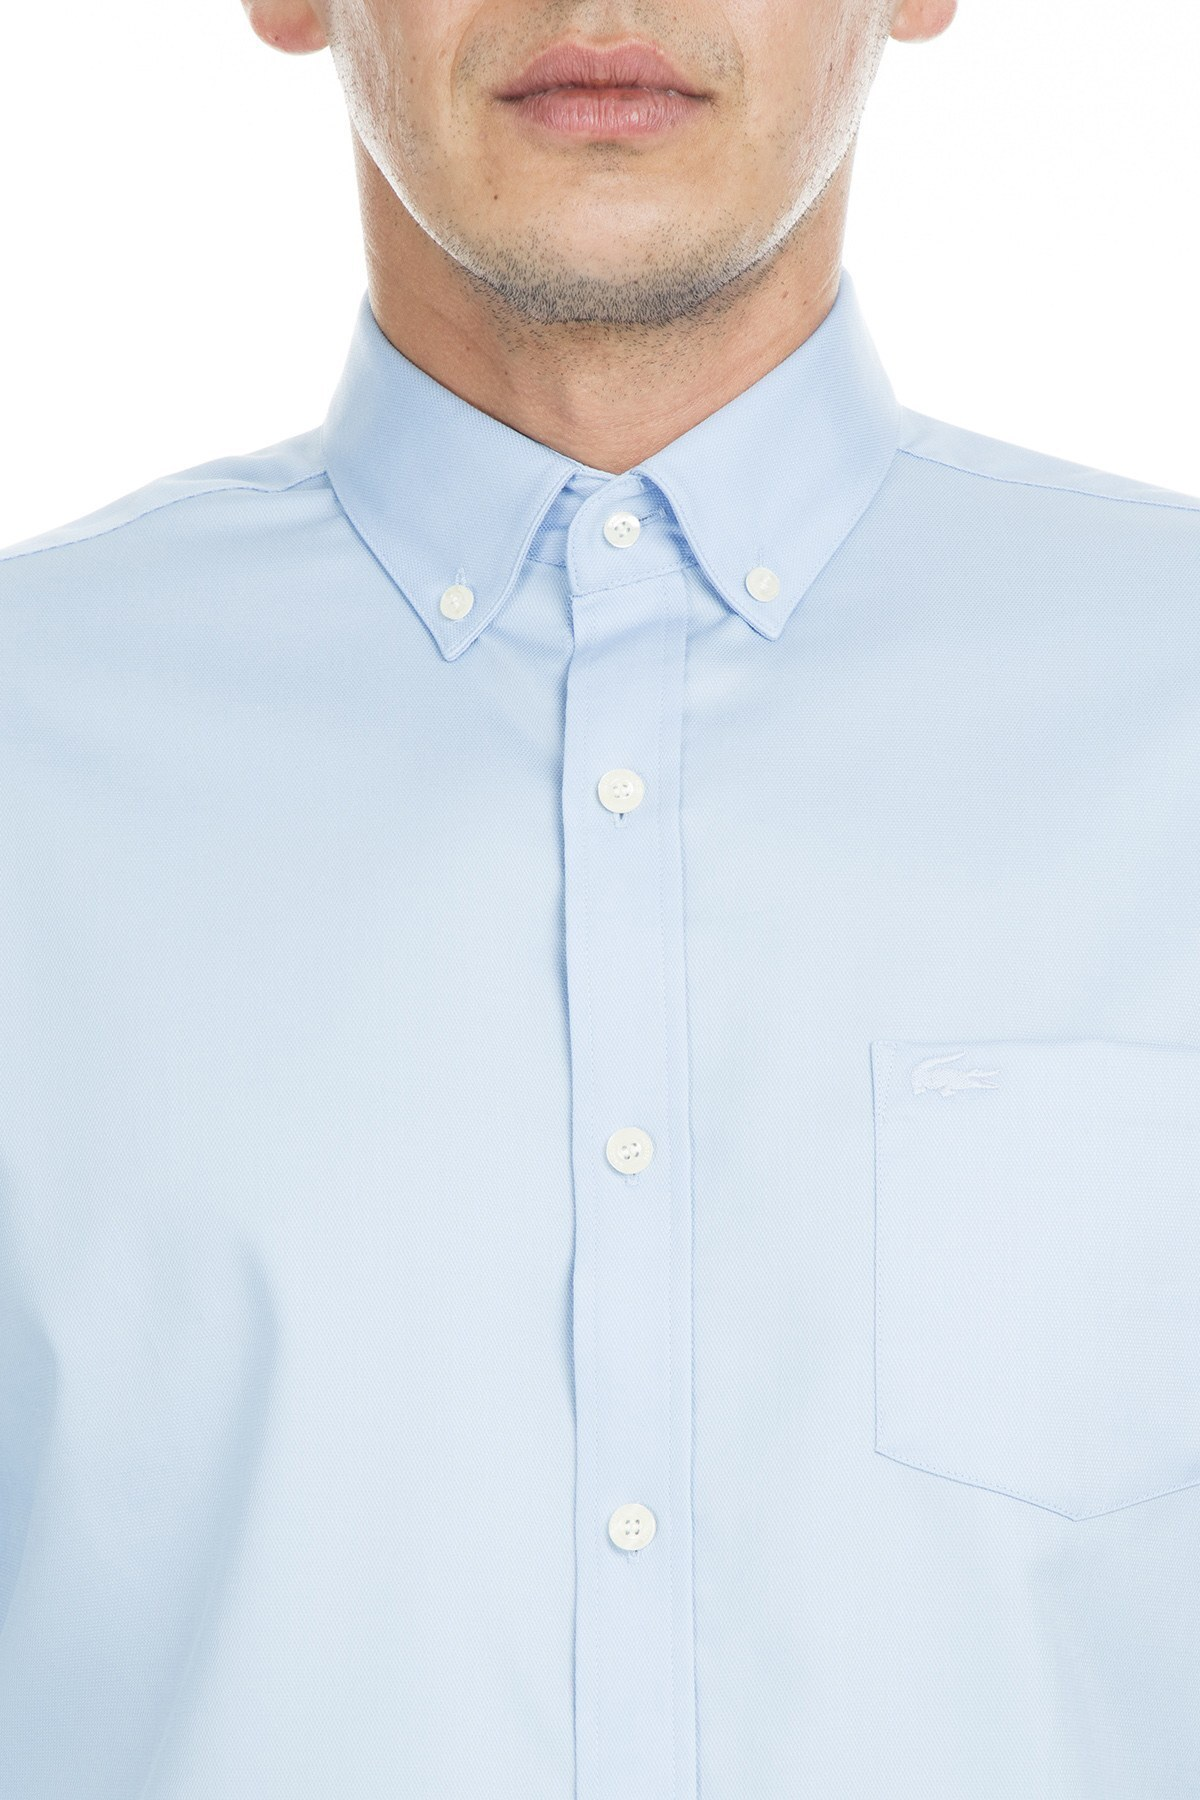 Lacoste Erkek Gömlek CH9623 6ZM MAVİ